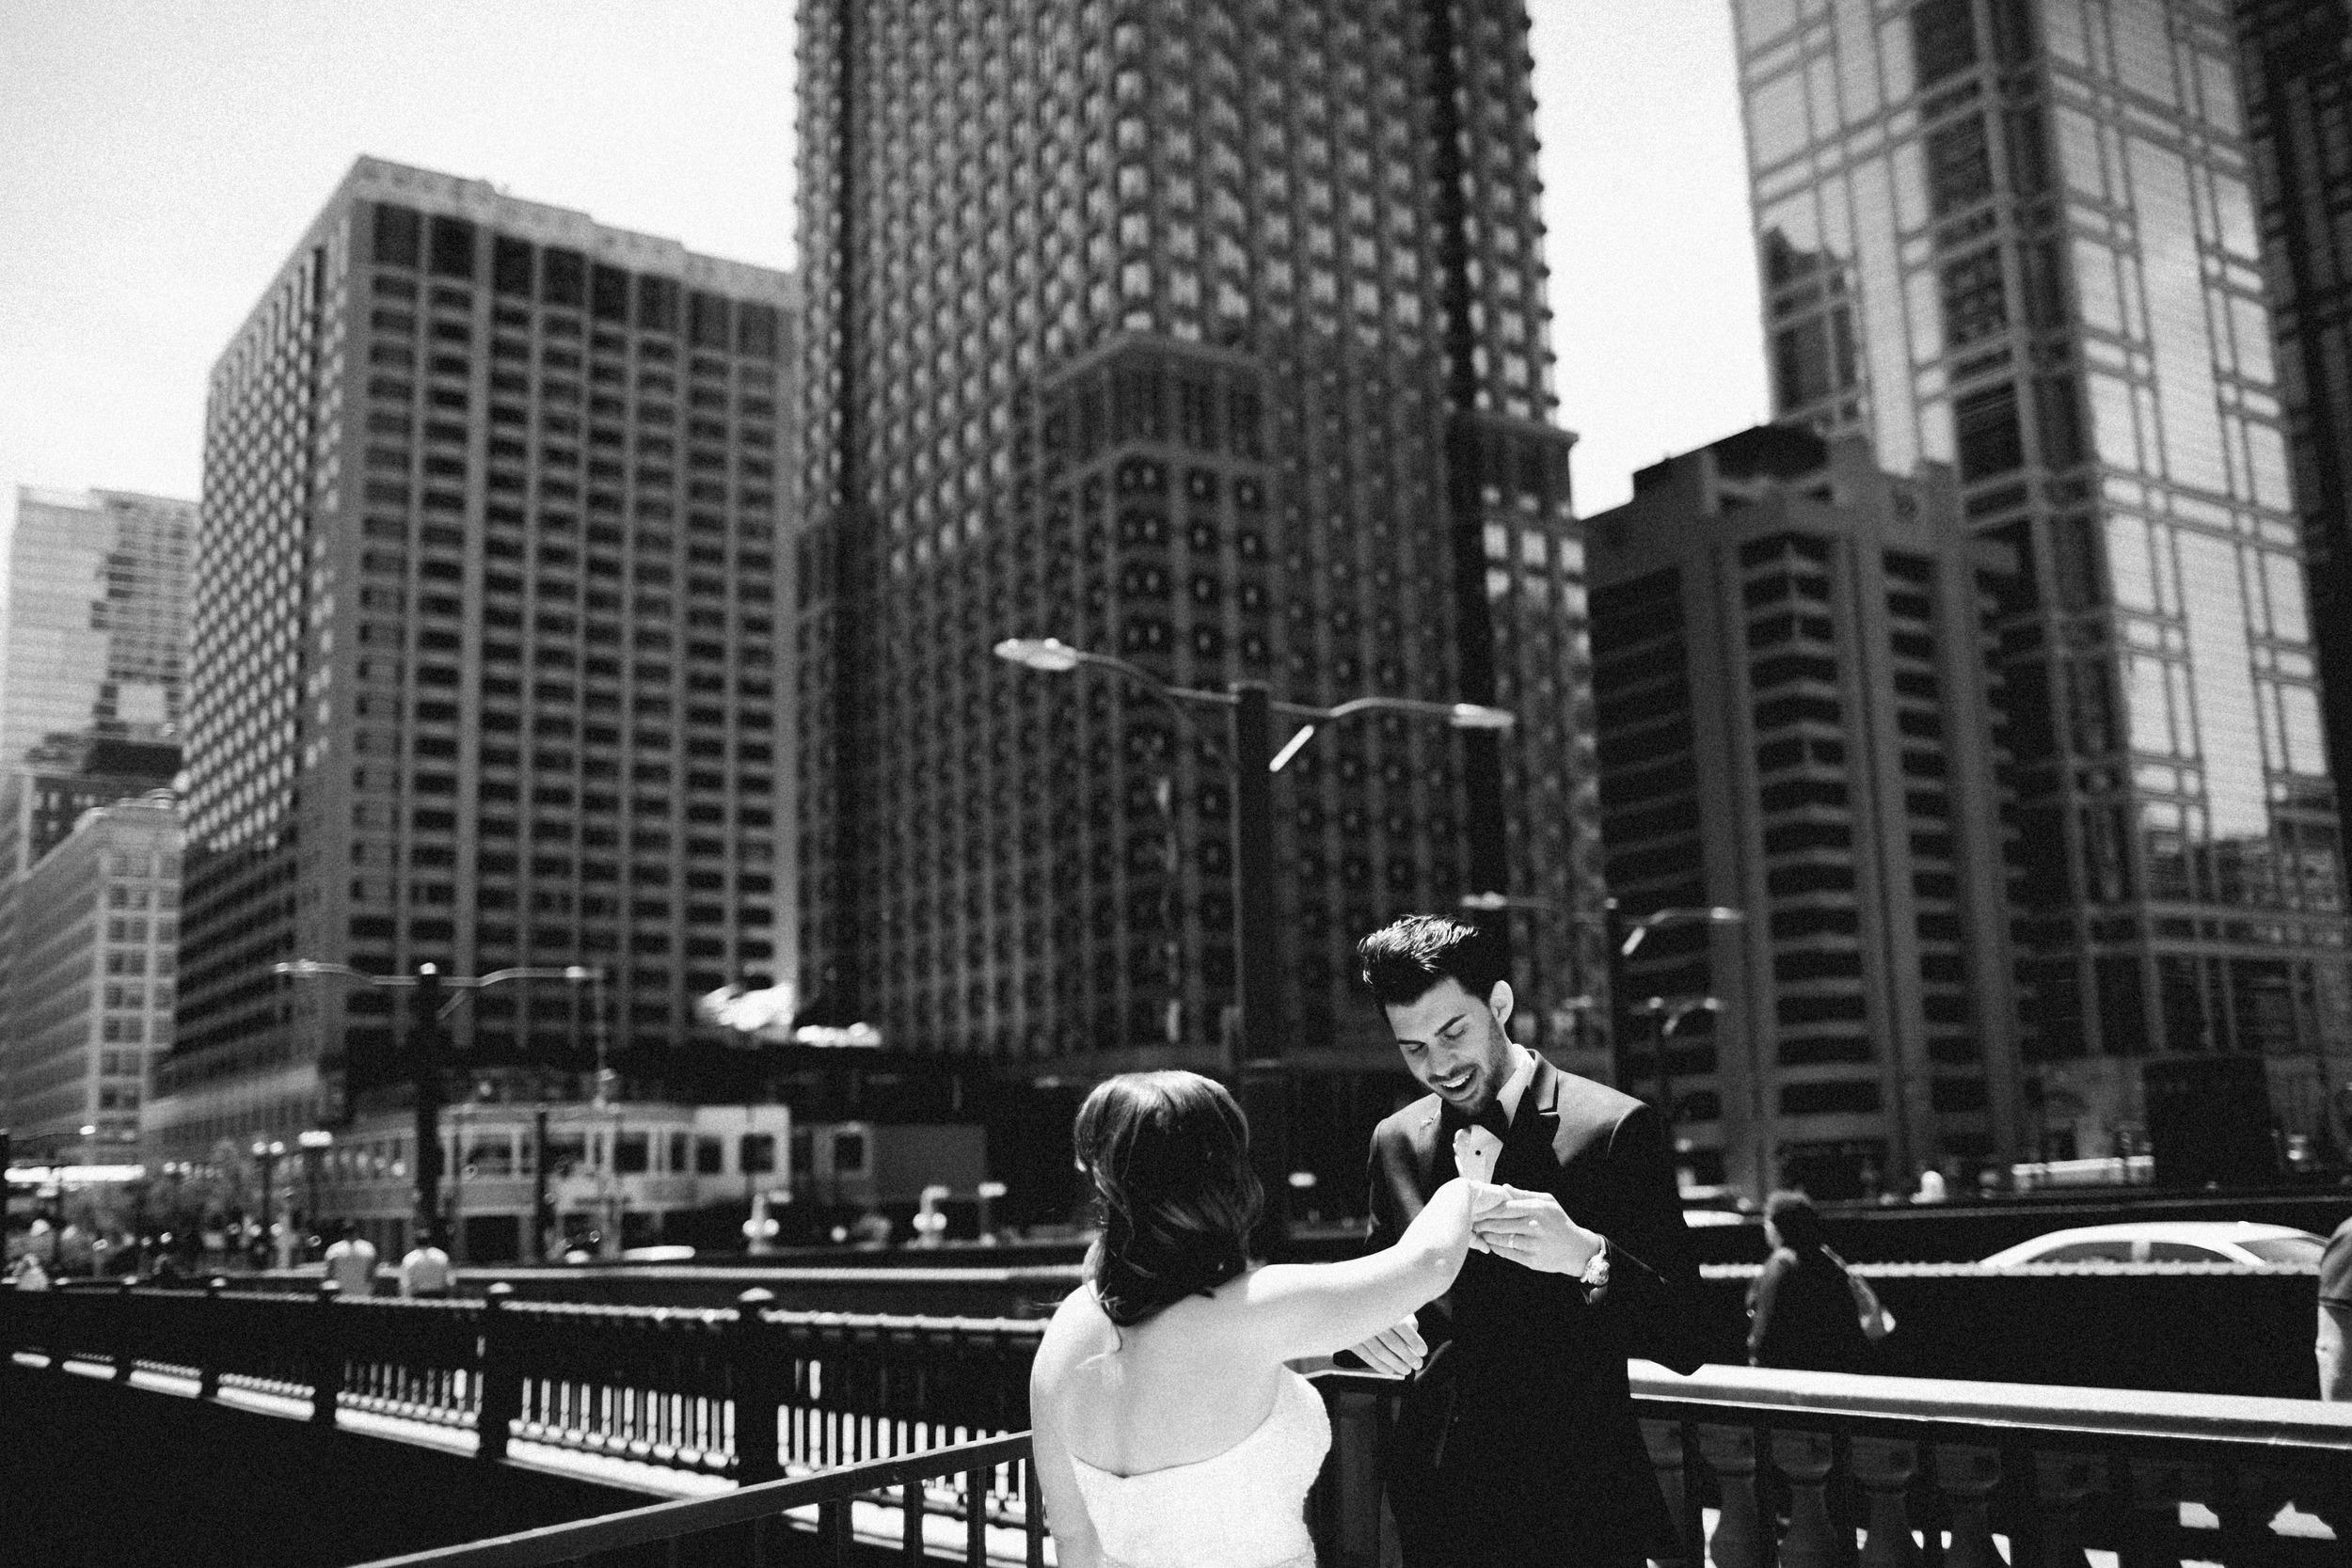 mayden_photography_weddings-38.jpg